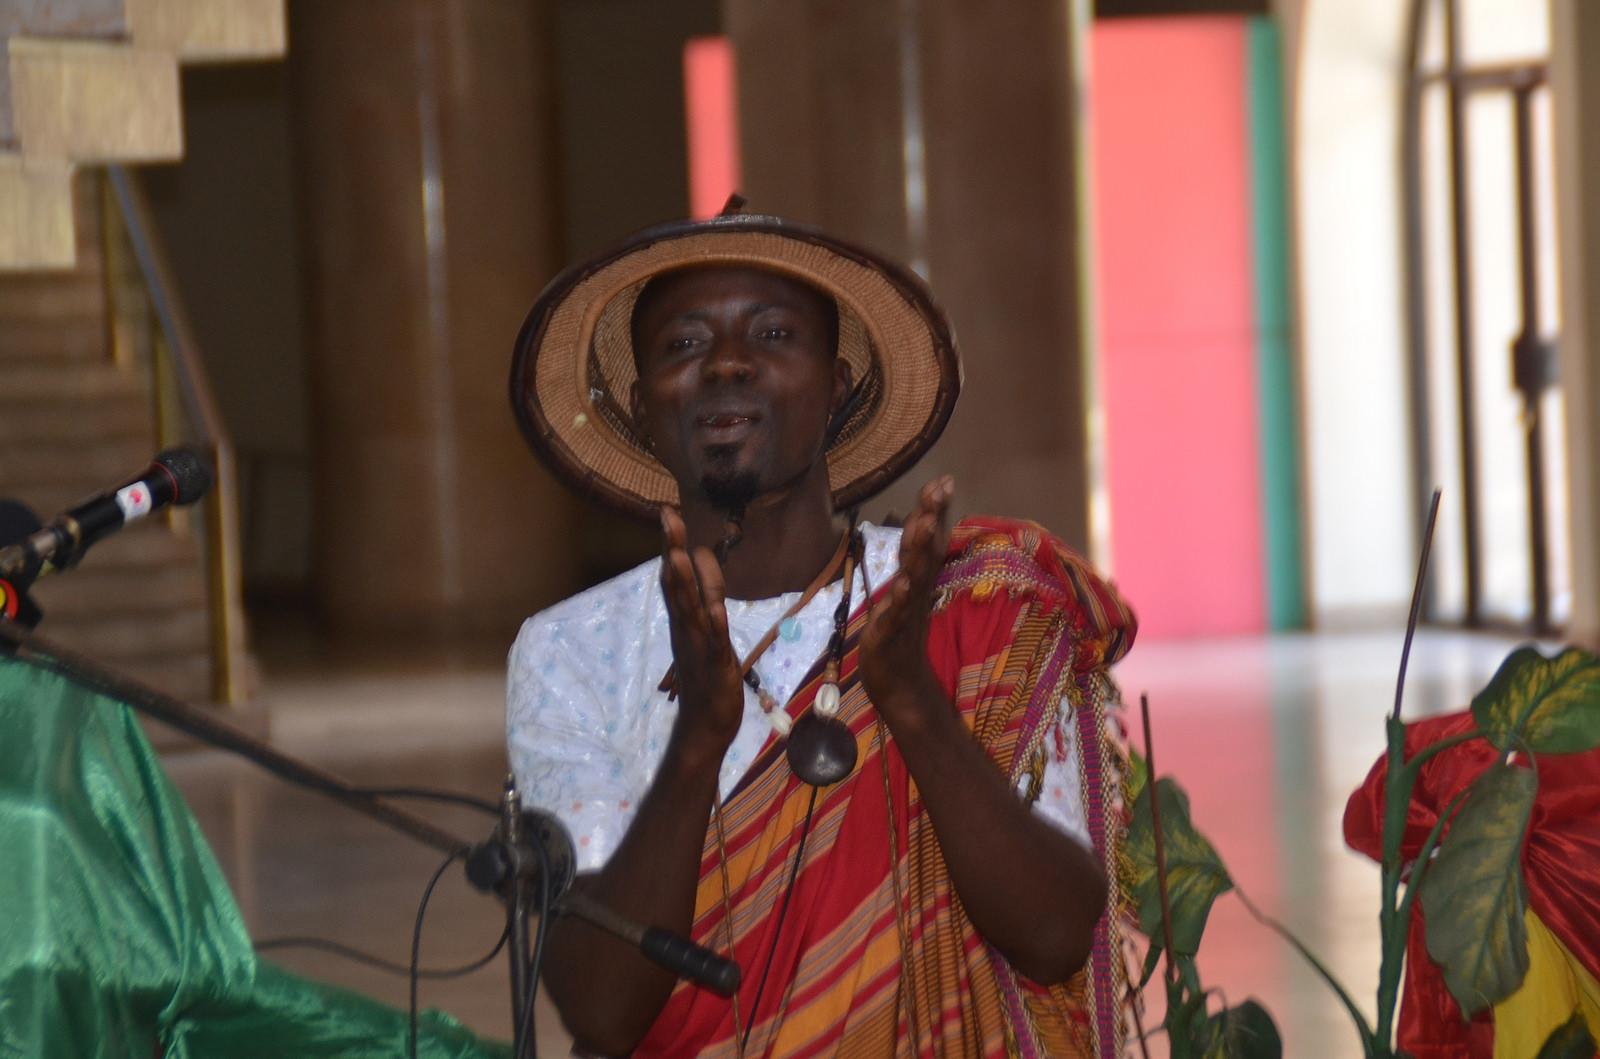 Poet Oswald performs in Uganda